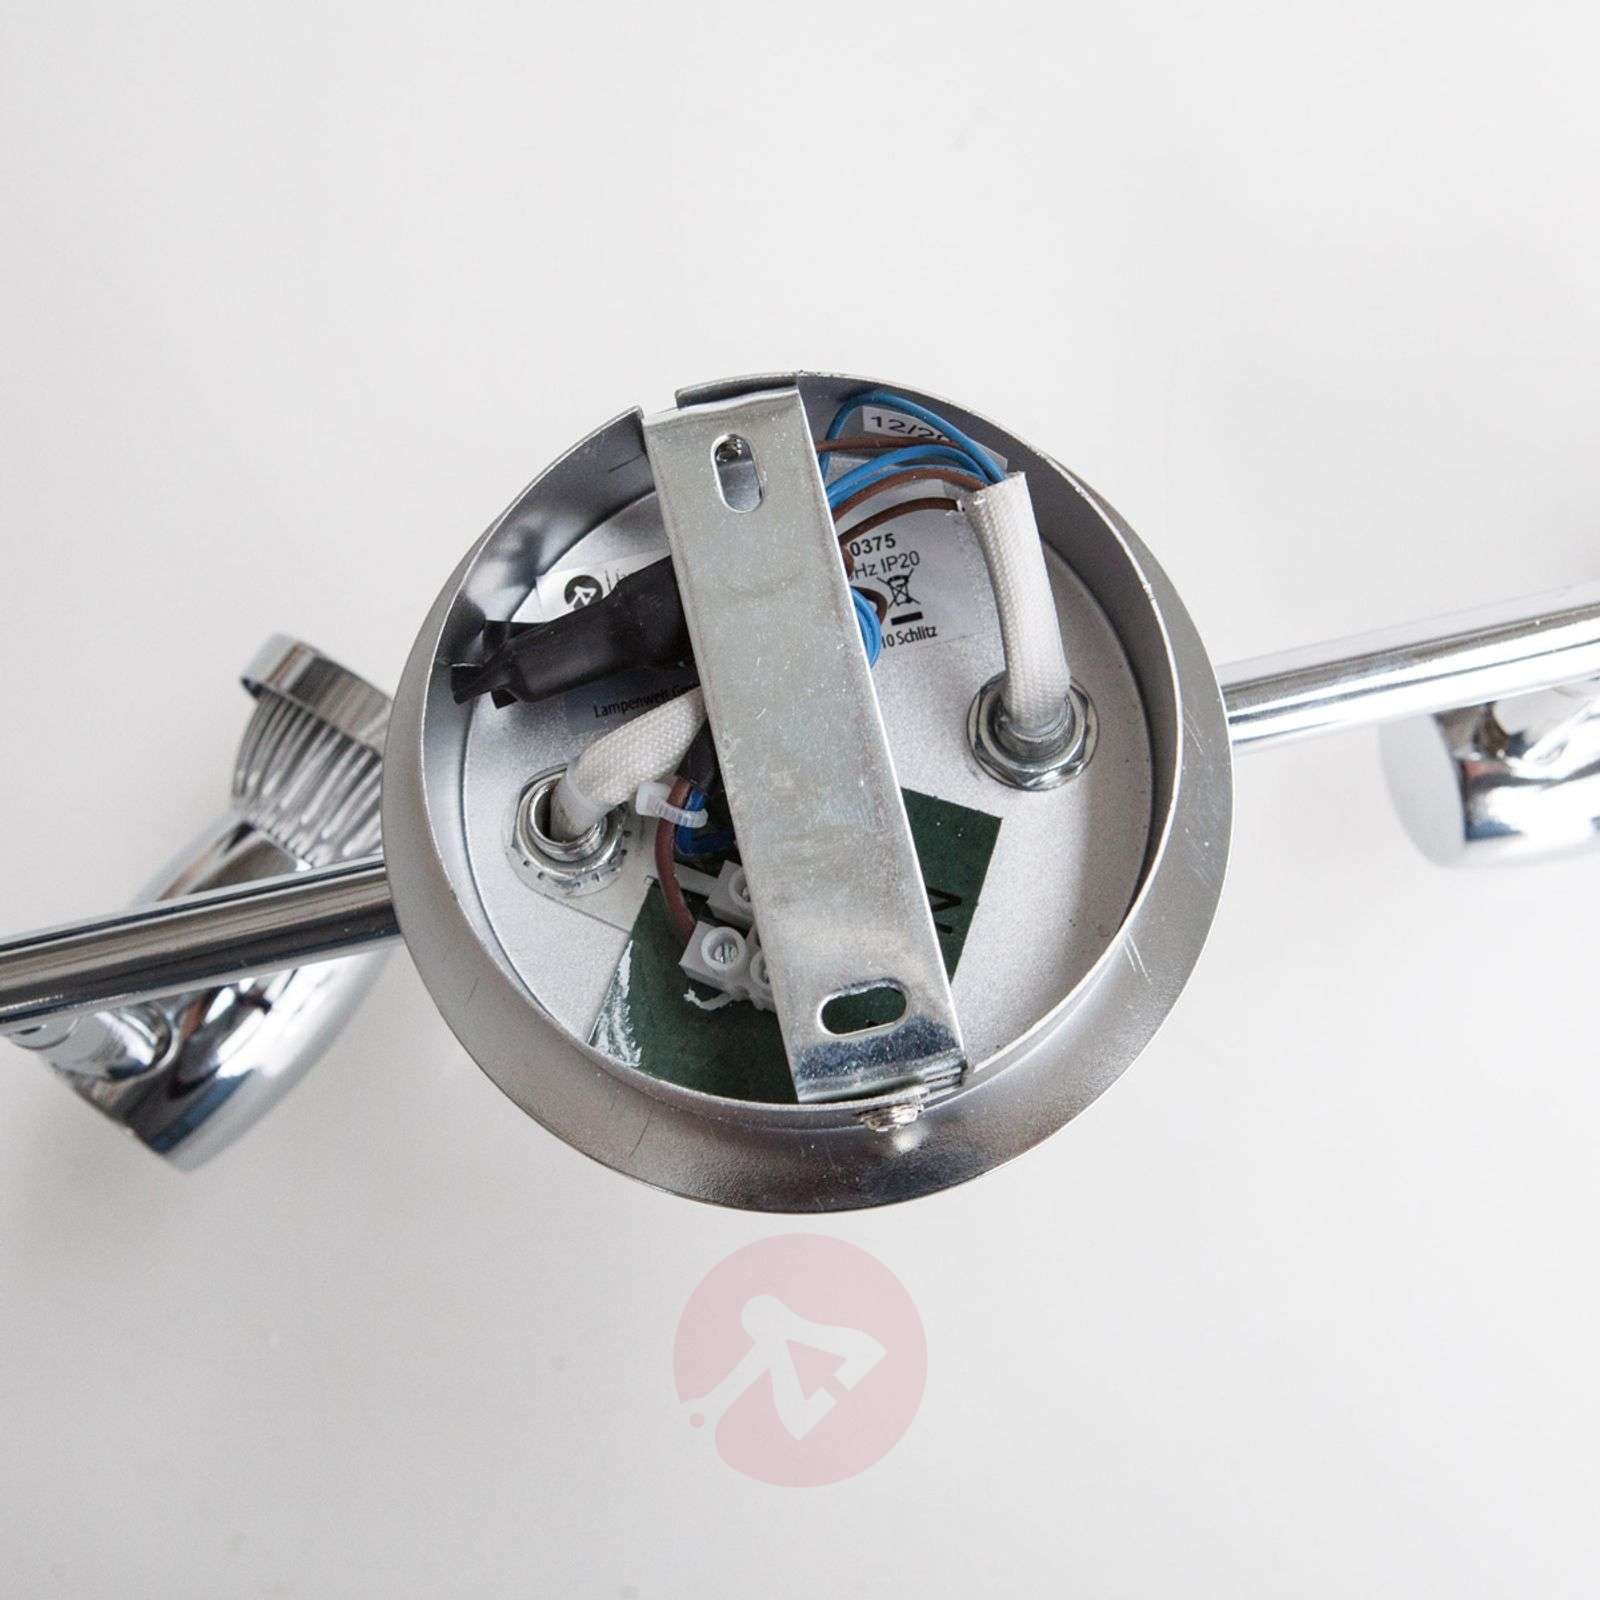 Six-bulb LED chrome ceiling lamp Arminius-9950375-010